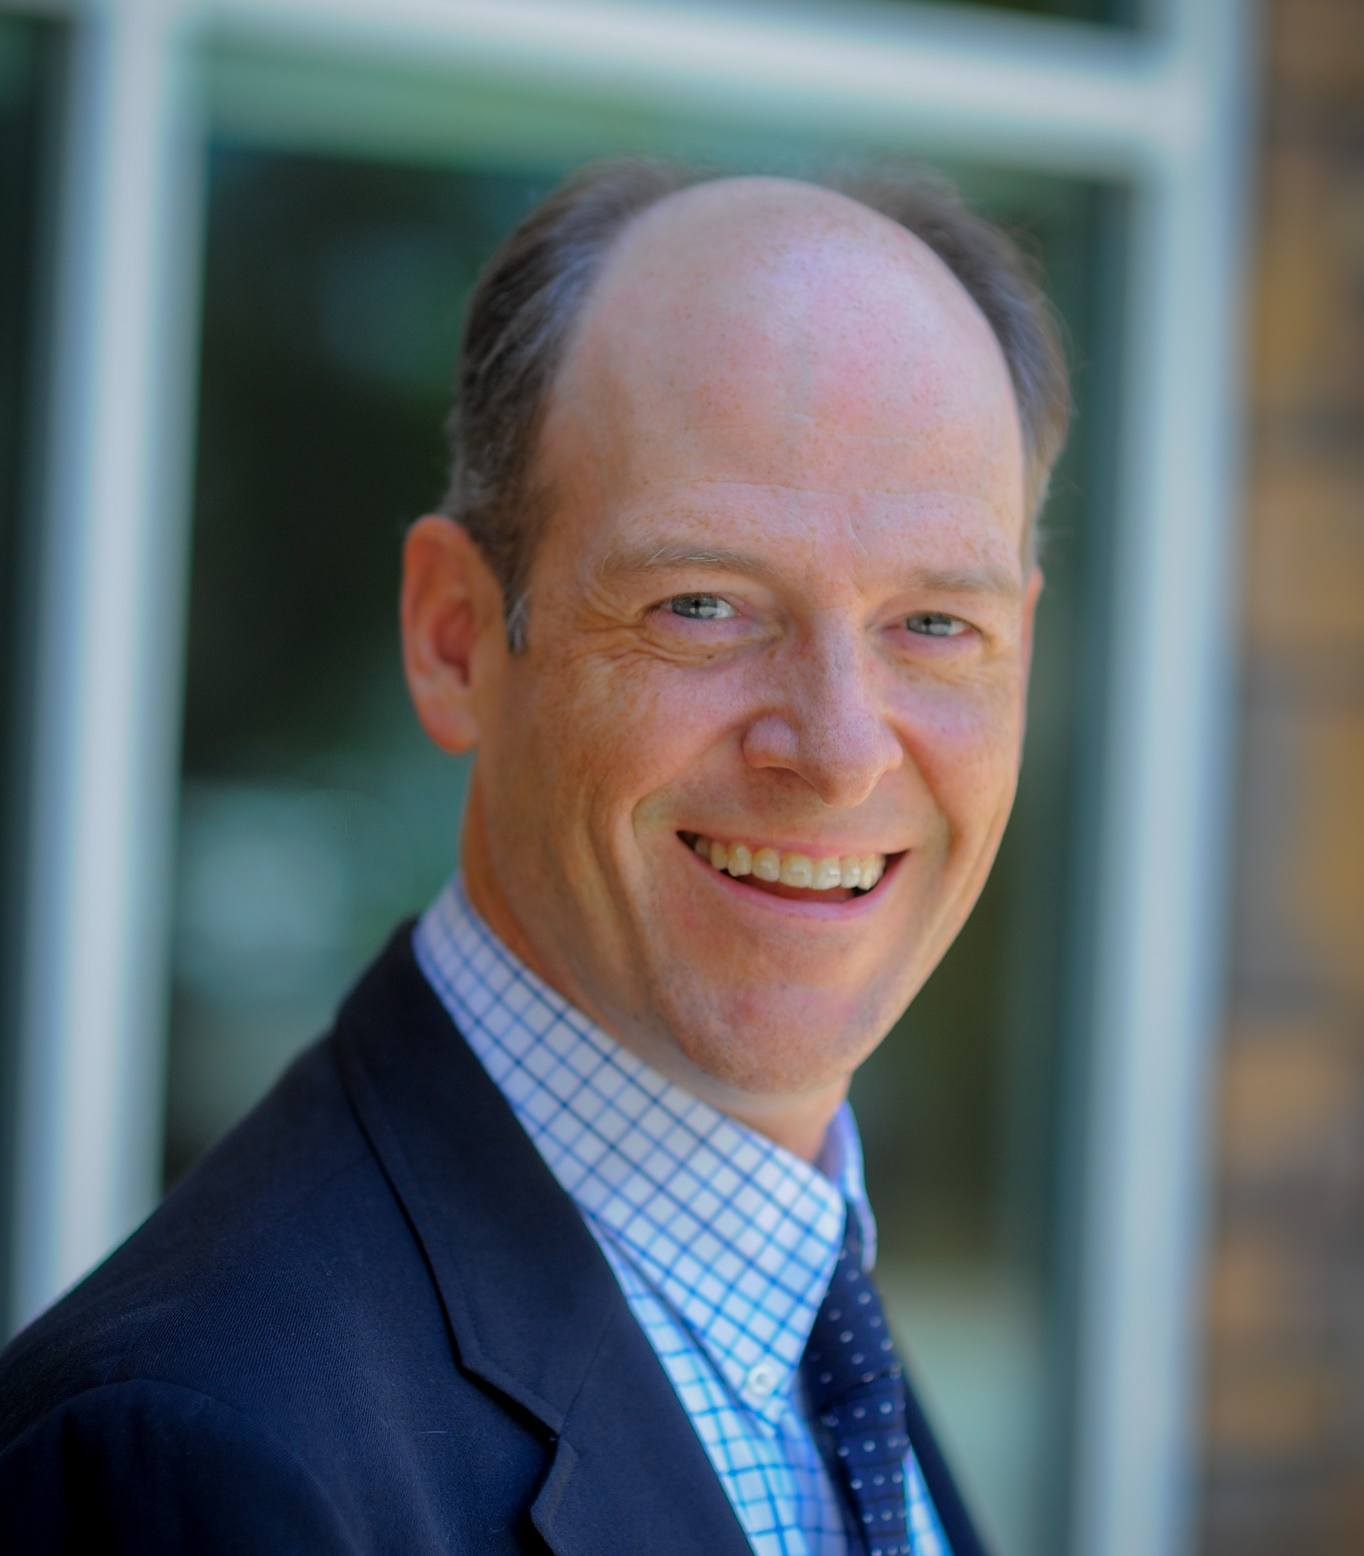 Christopher Allen, DBIA